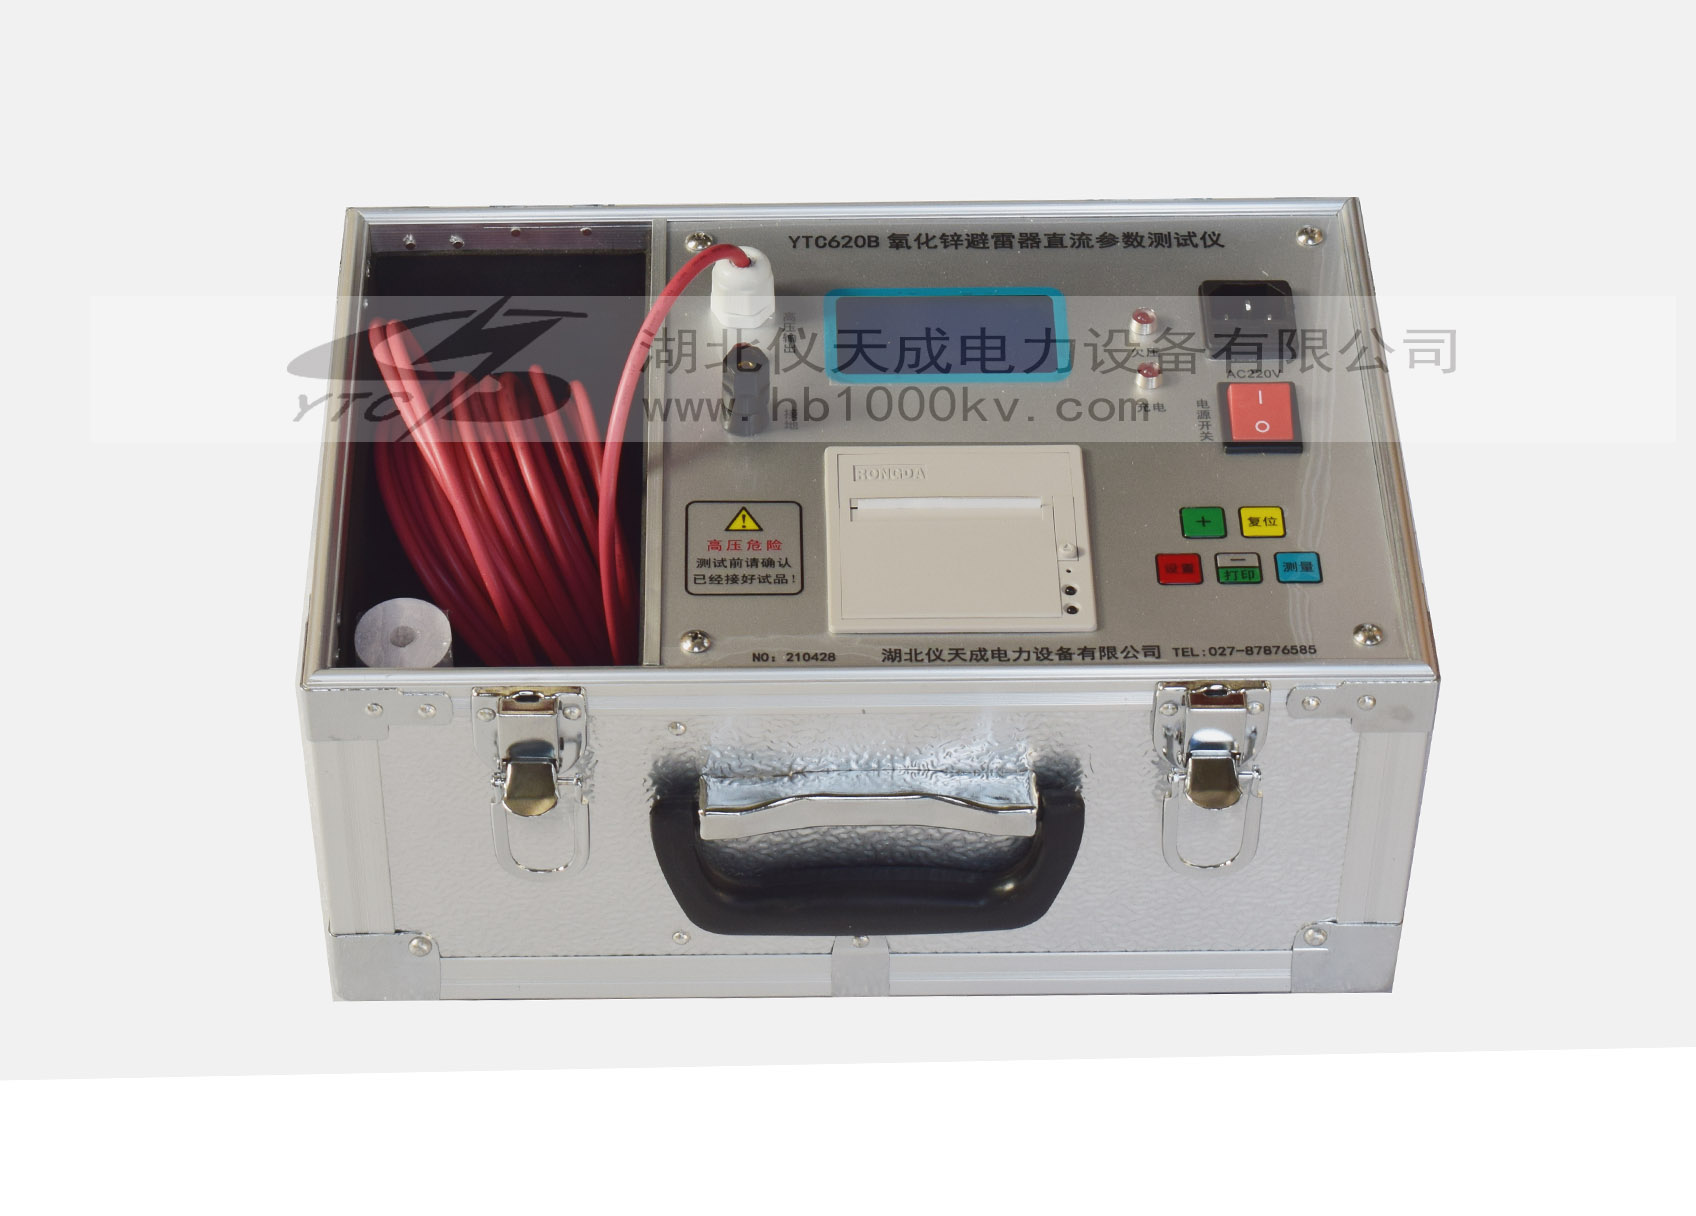 YTC620B氧化锌避雷器直流参数测试仪面板图